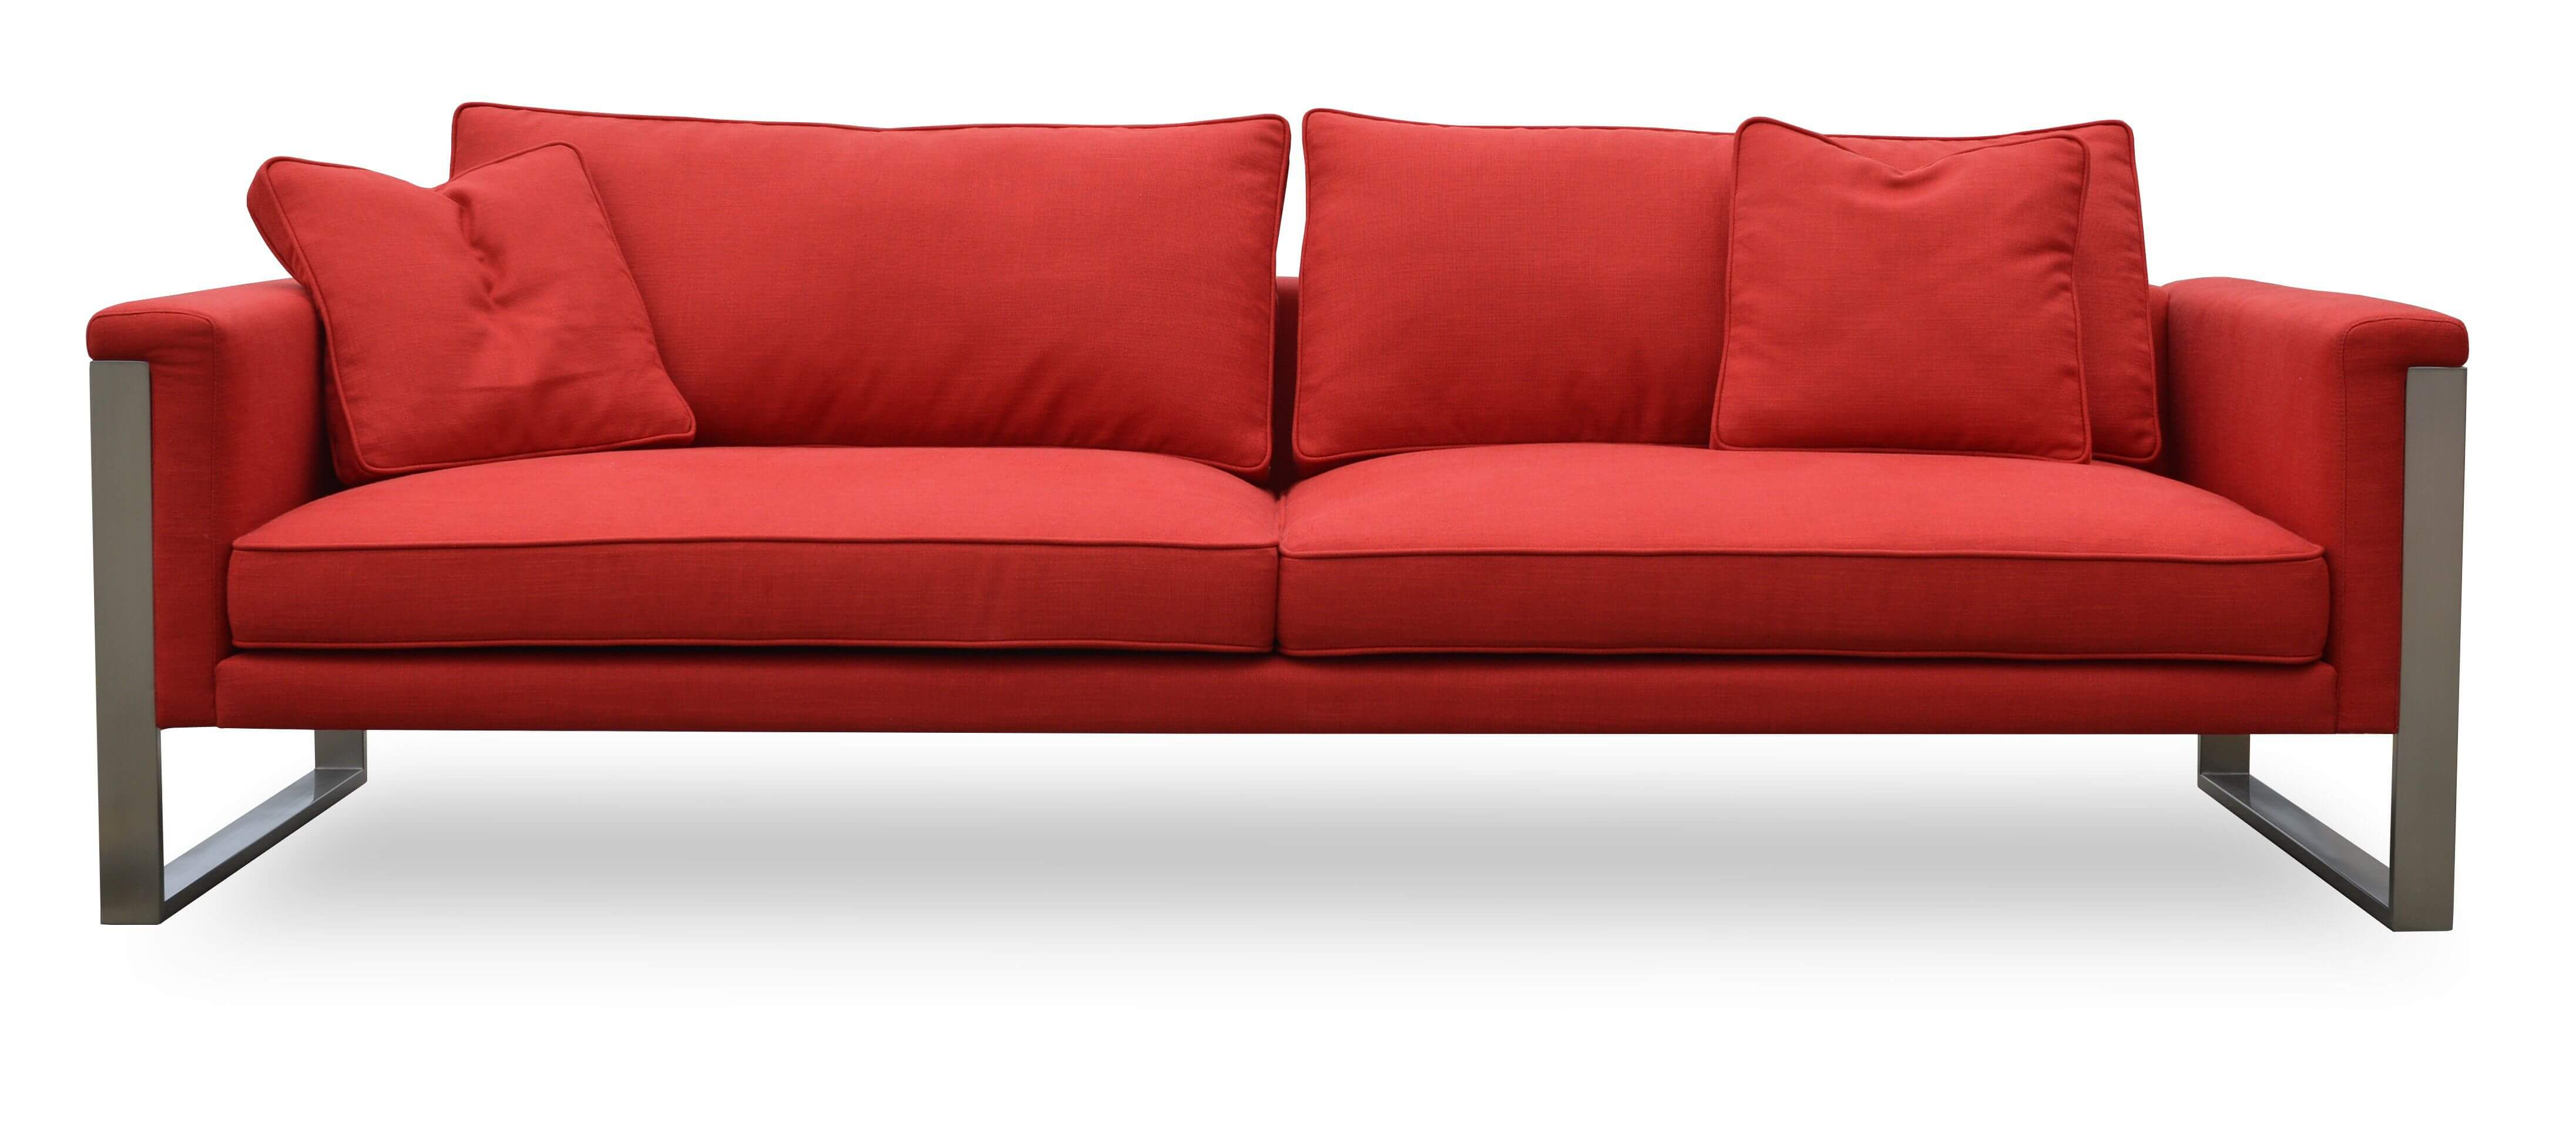 Boston sofa dark grey tweed buy online at best price for Grey tweed couch